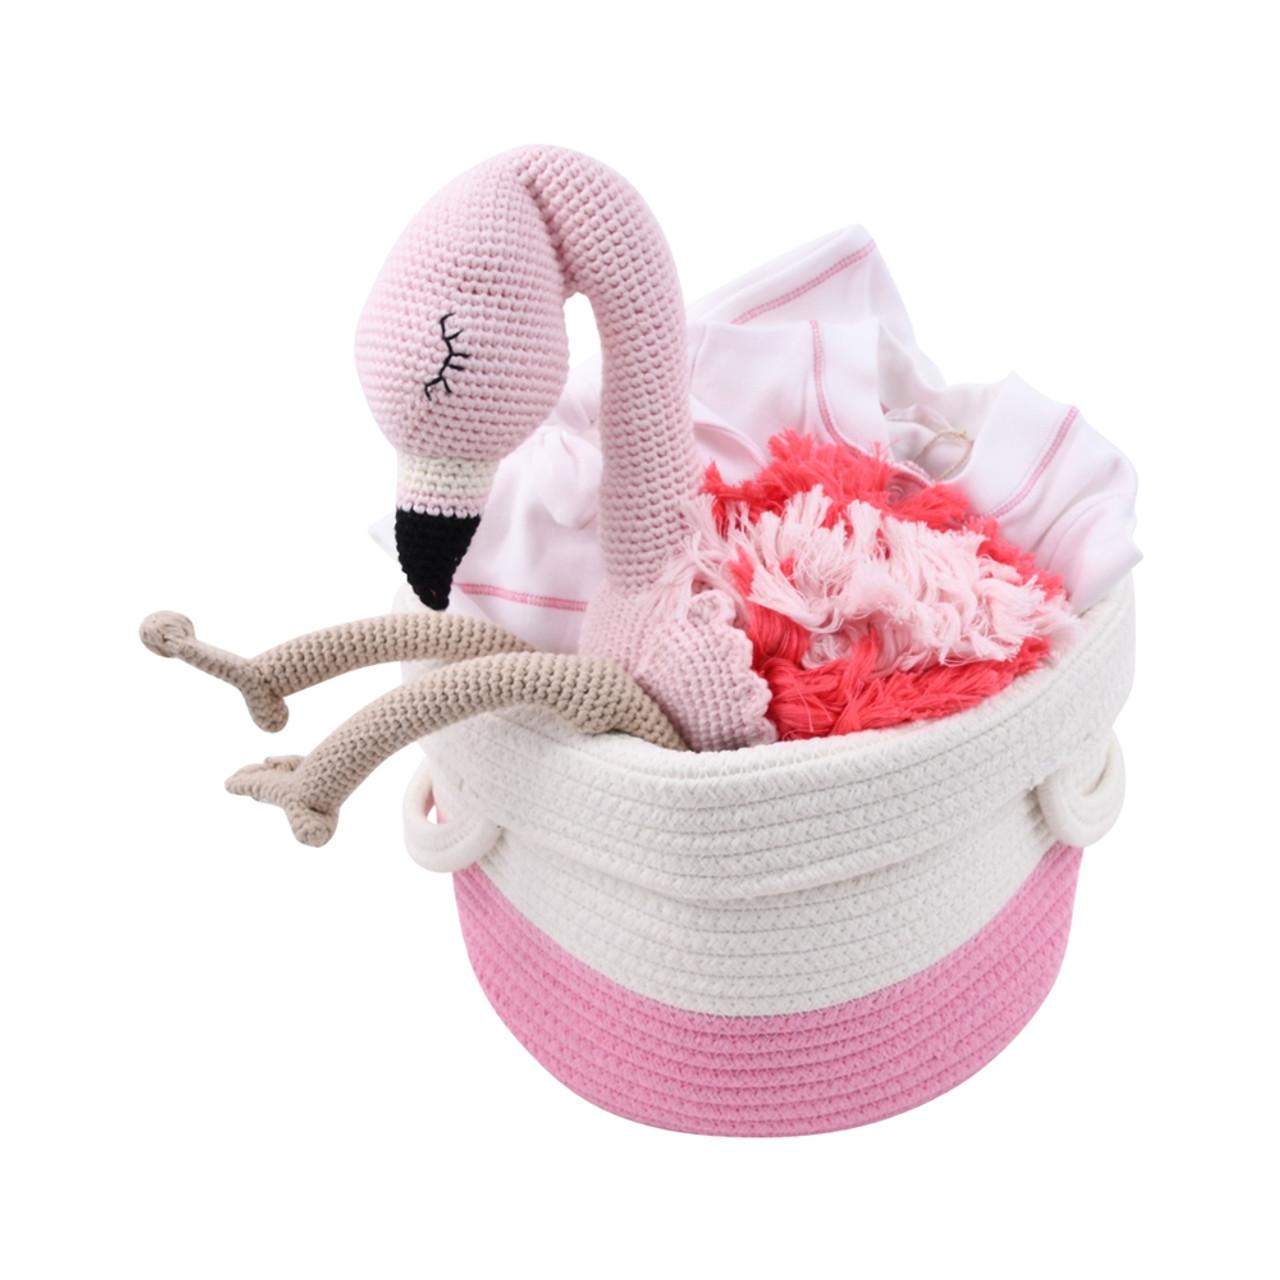 High End Baby Gifts -  Flamingo Fun